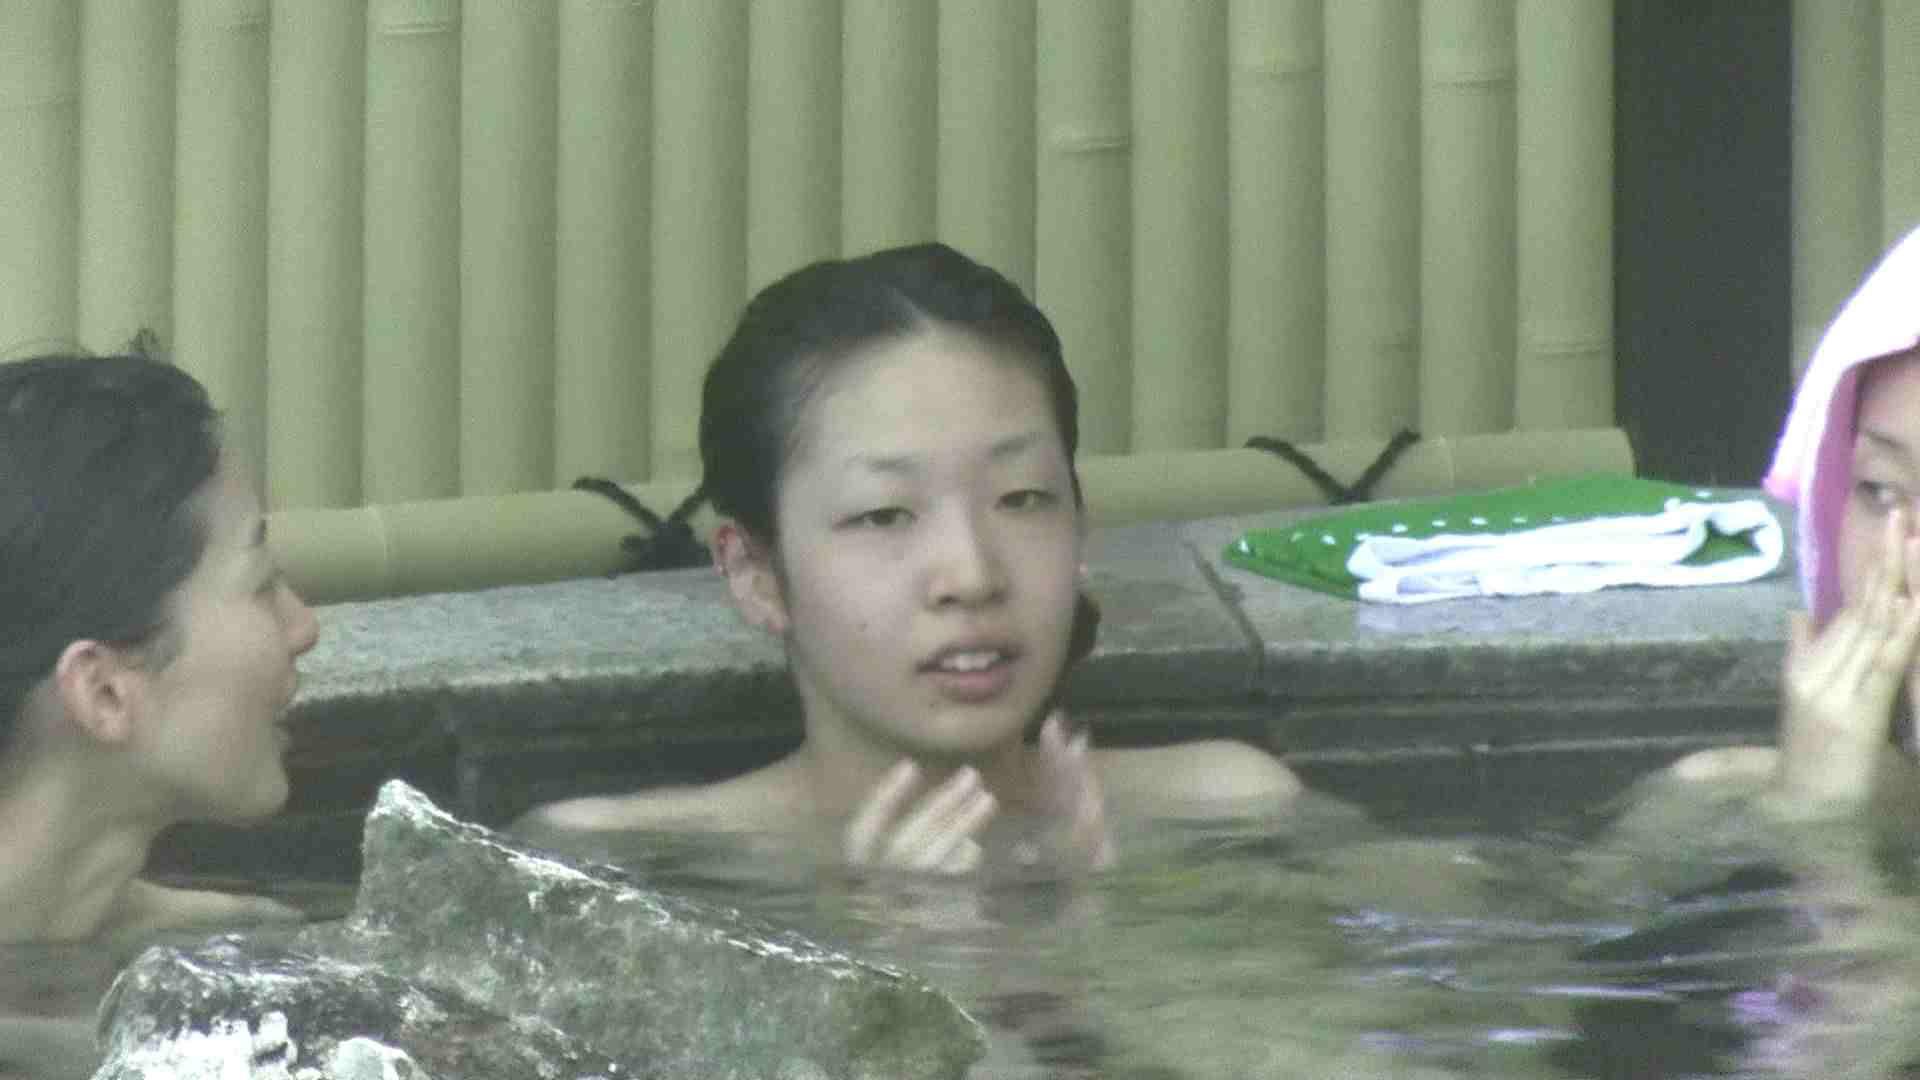 Aquaな露天風呂Vol.195 OLセックス 盗撮ワレメ無修正動画無料 71画像 20